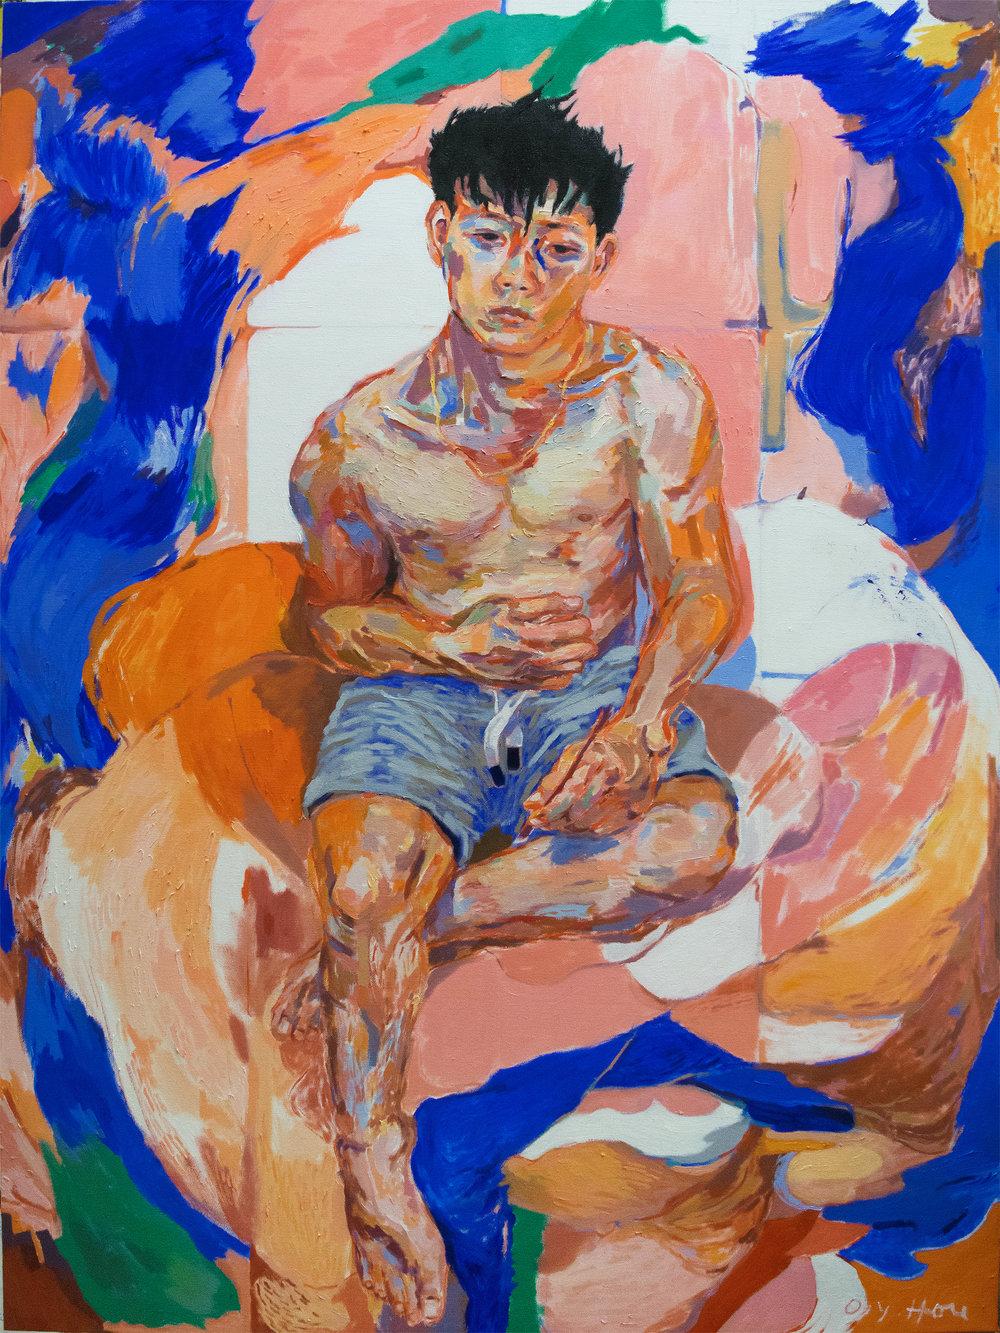 Self-portrait (19)  by Oscar yi Hou